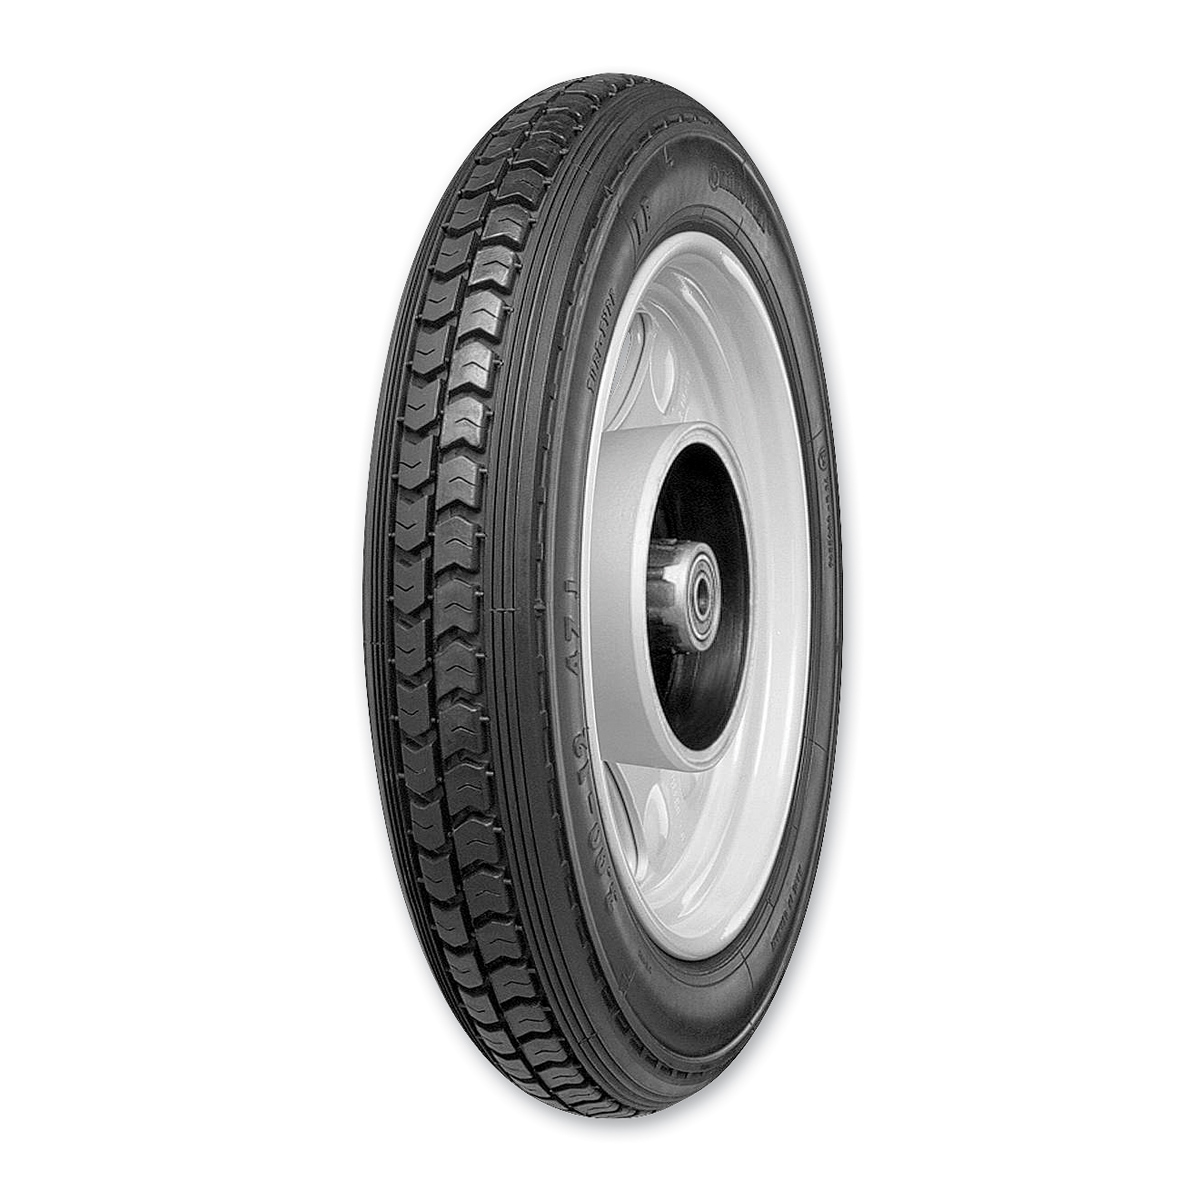 Continental LB 3.50-8 Front/Rear Tire